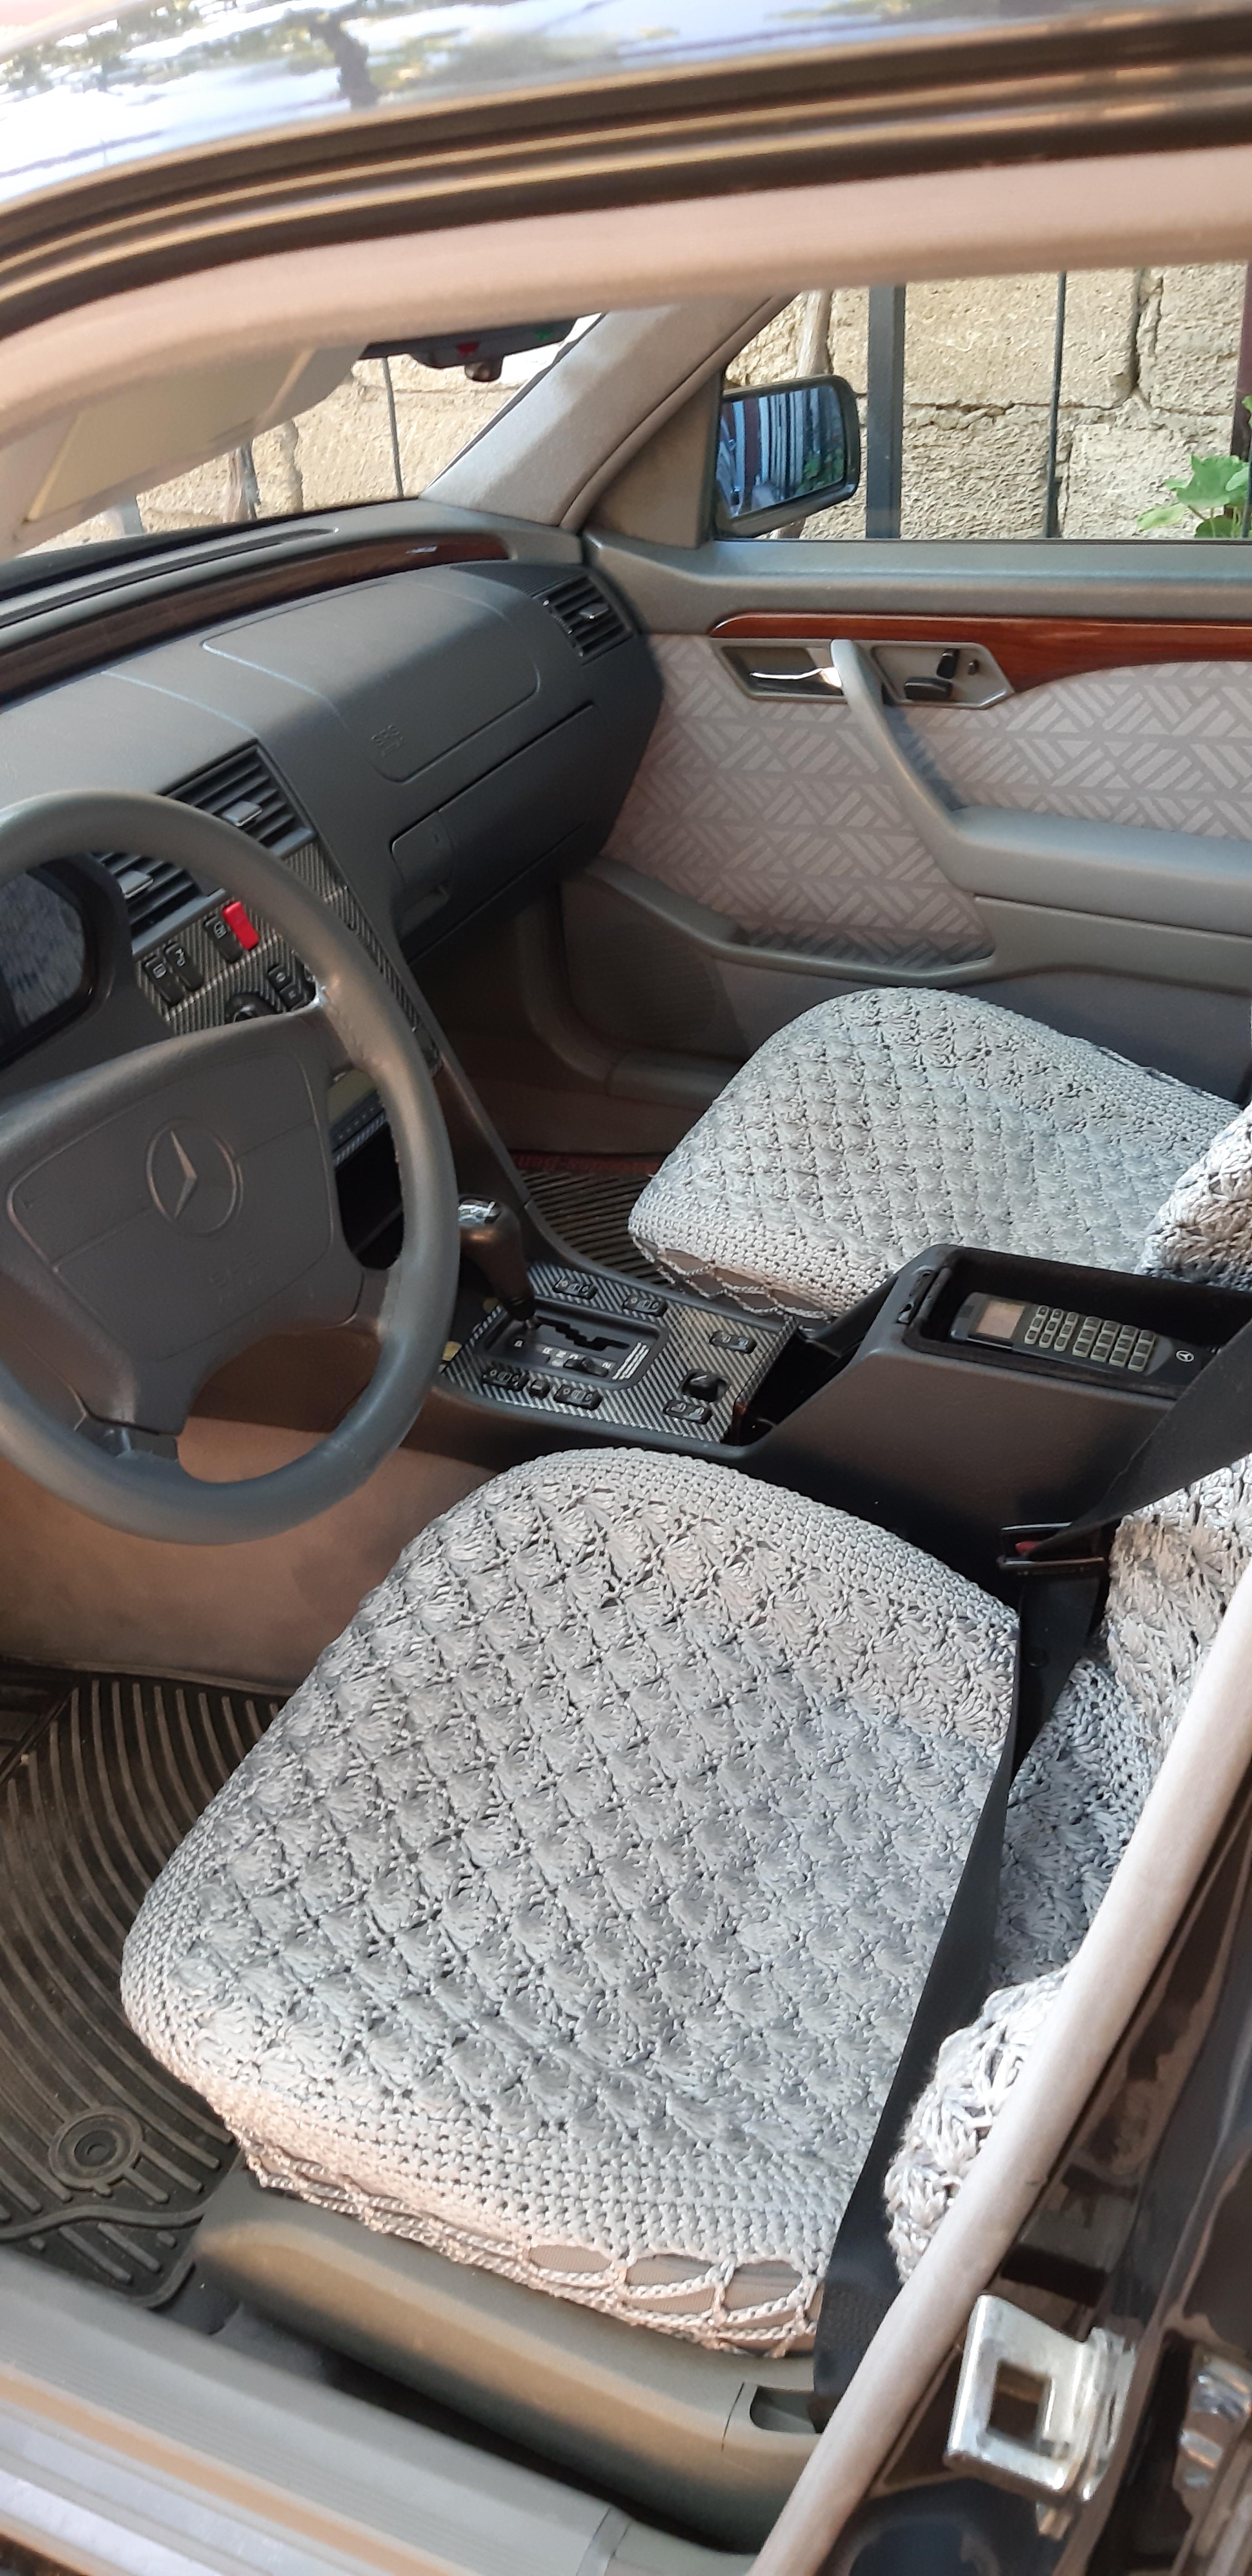 Mercedes-Benz C 220 2.2(lt) 1995 İkinci əl  $9300